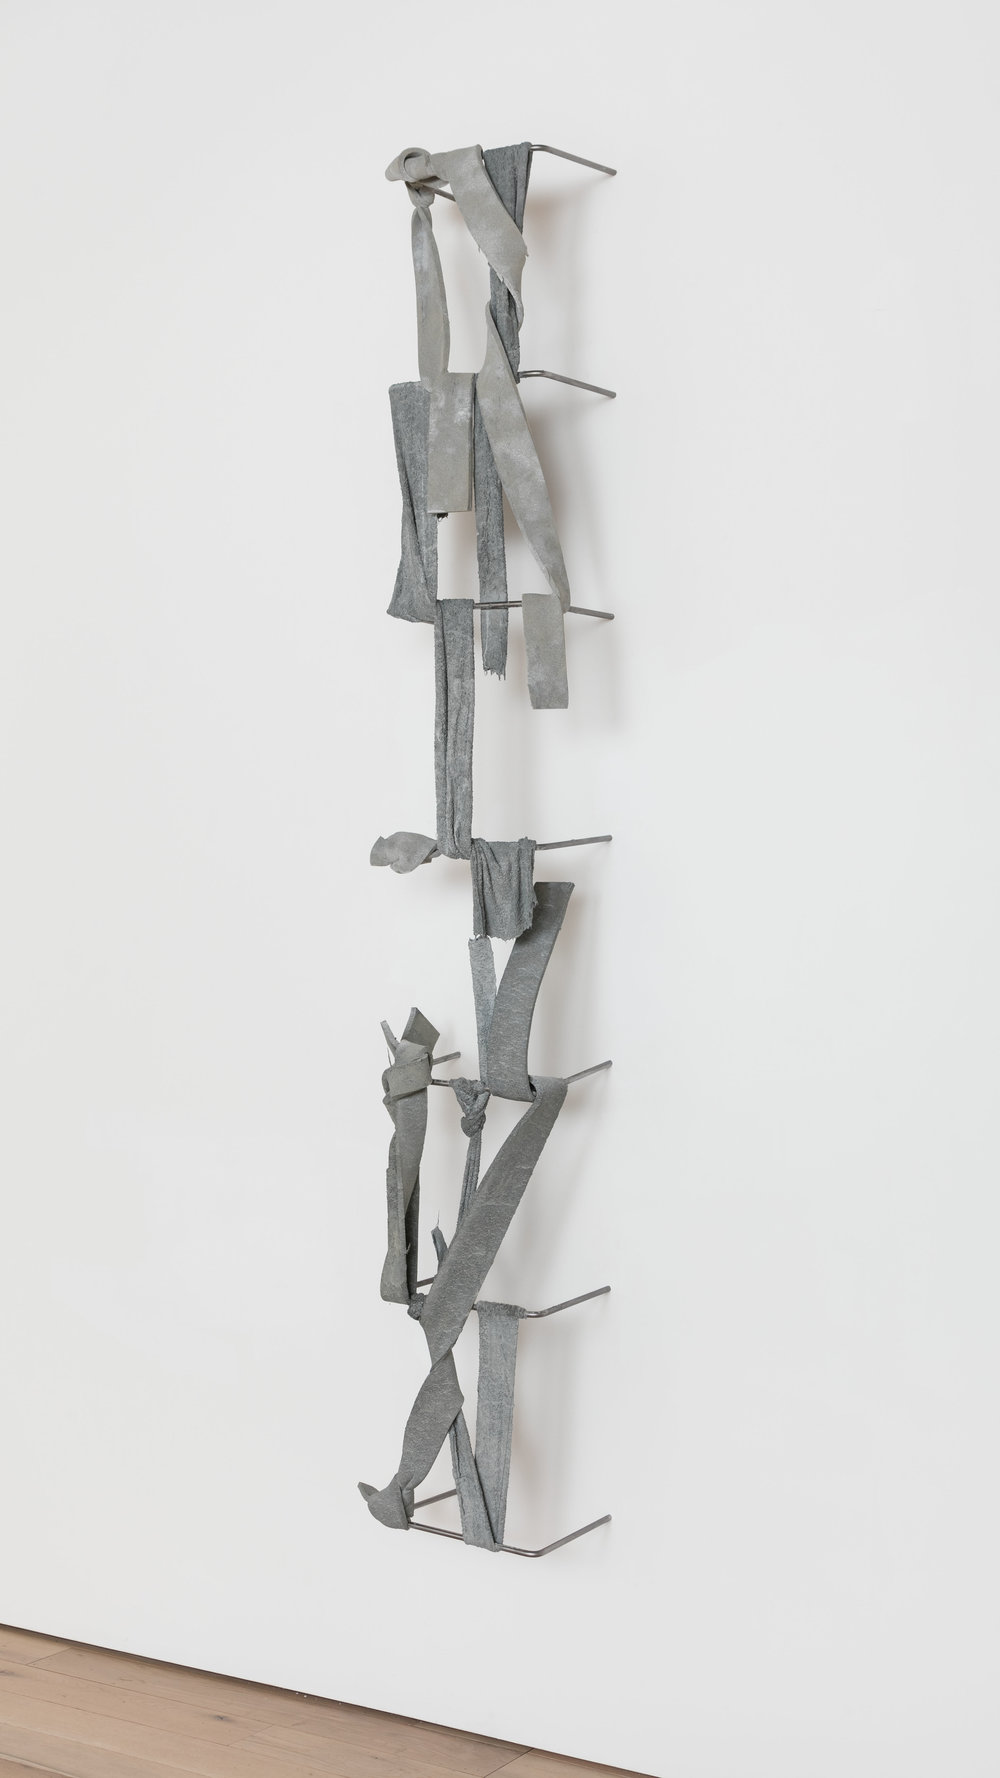 Nikita Gale,  FIXED LOOP III-IV , 2018, concrete, polyurethane foam, terrycloth, steel, 115 × 18 × 13 in.